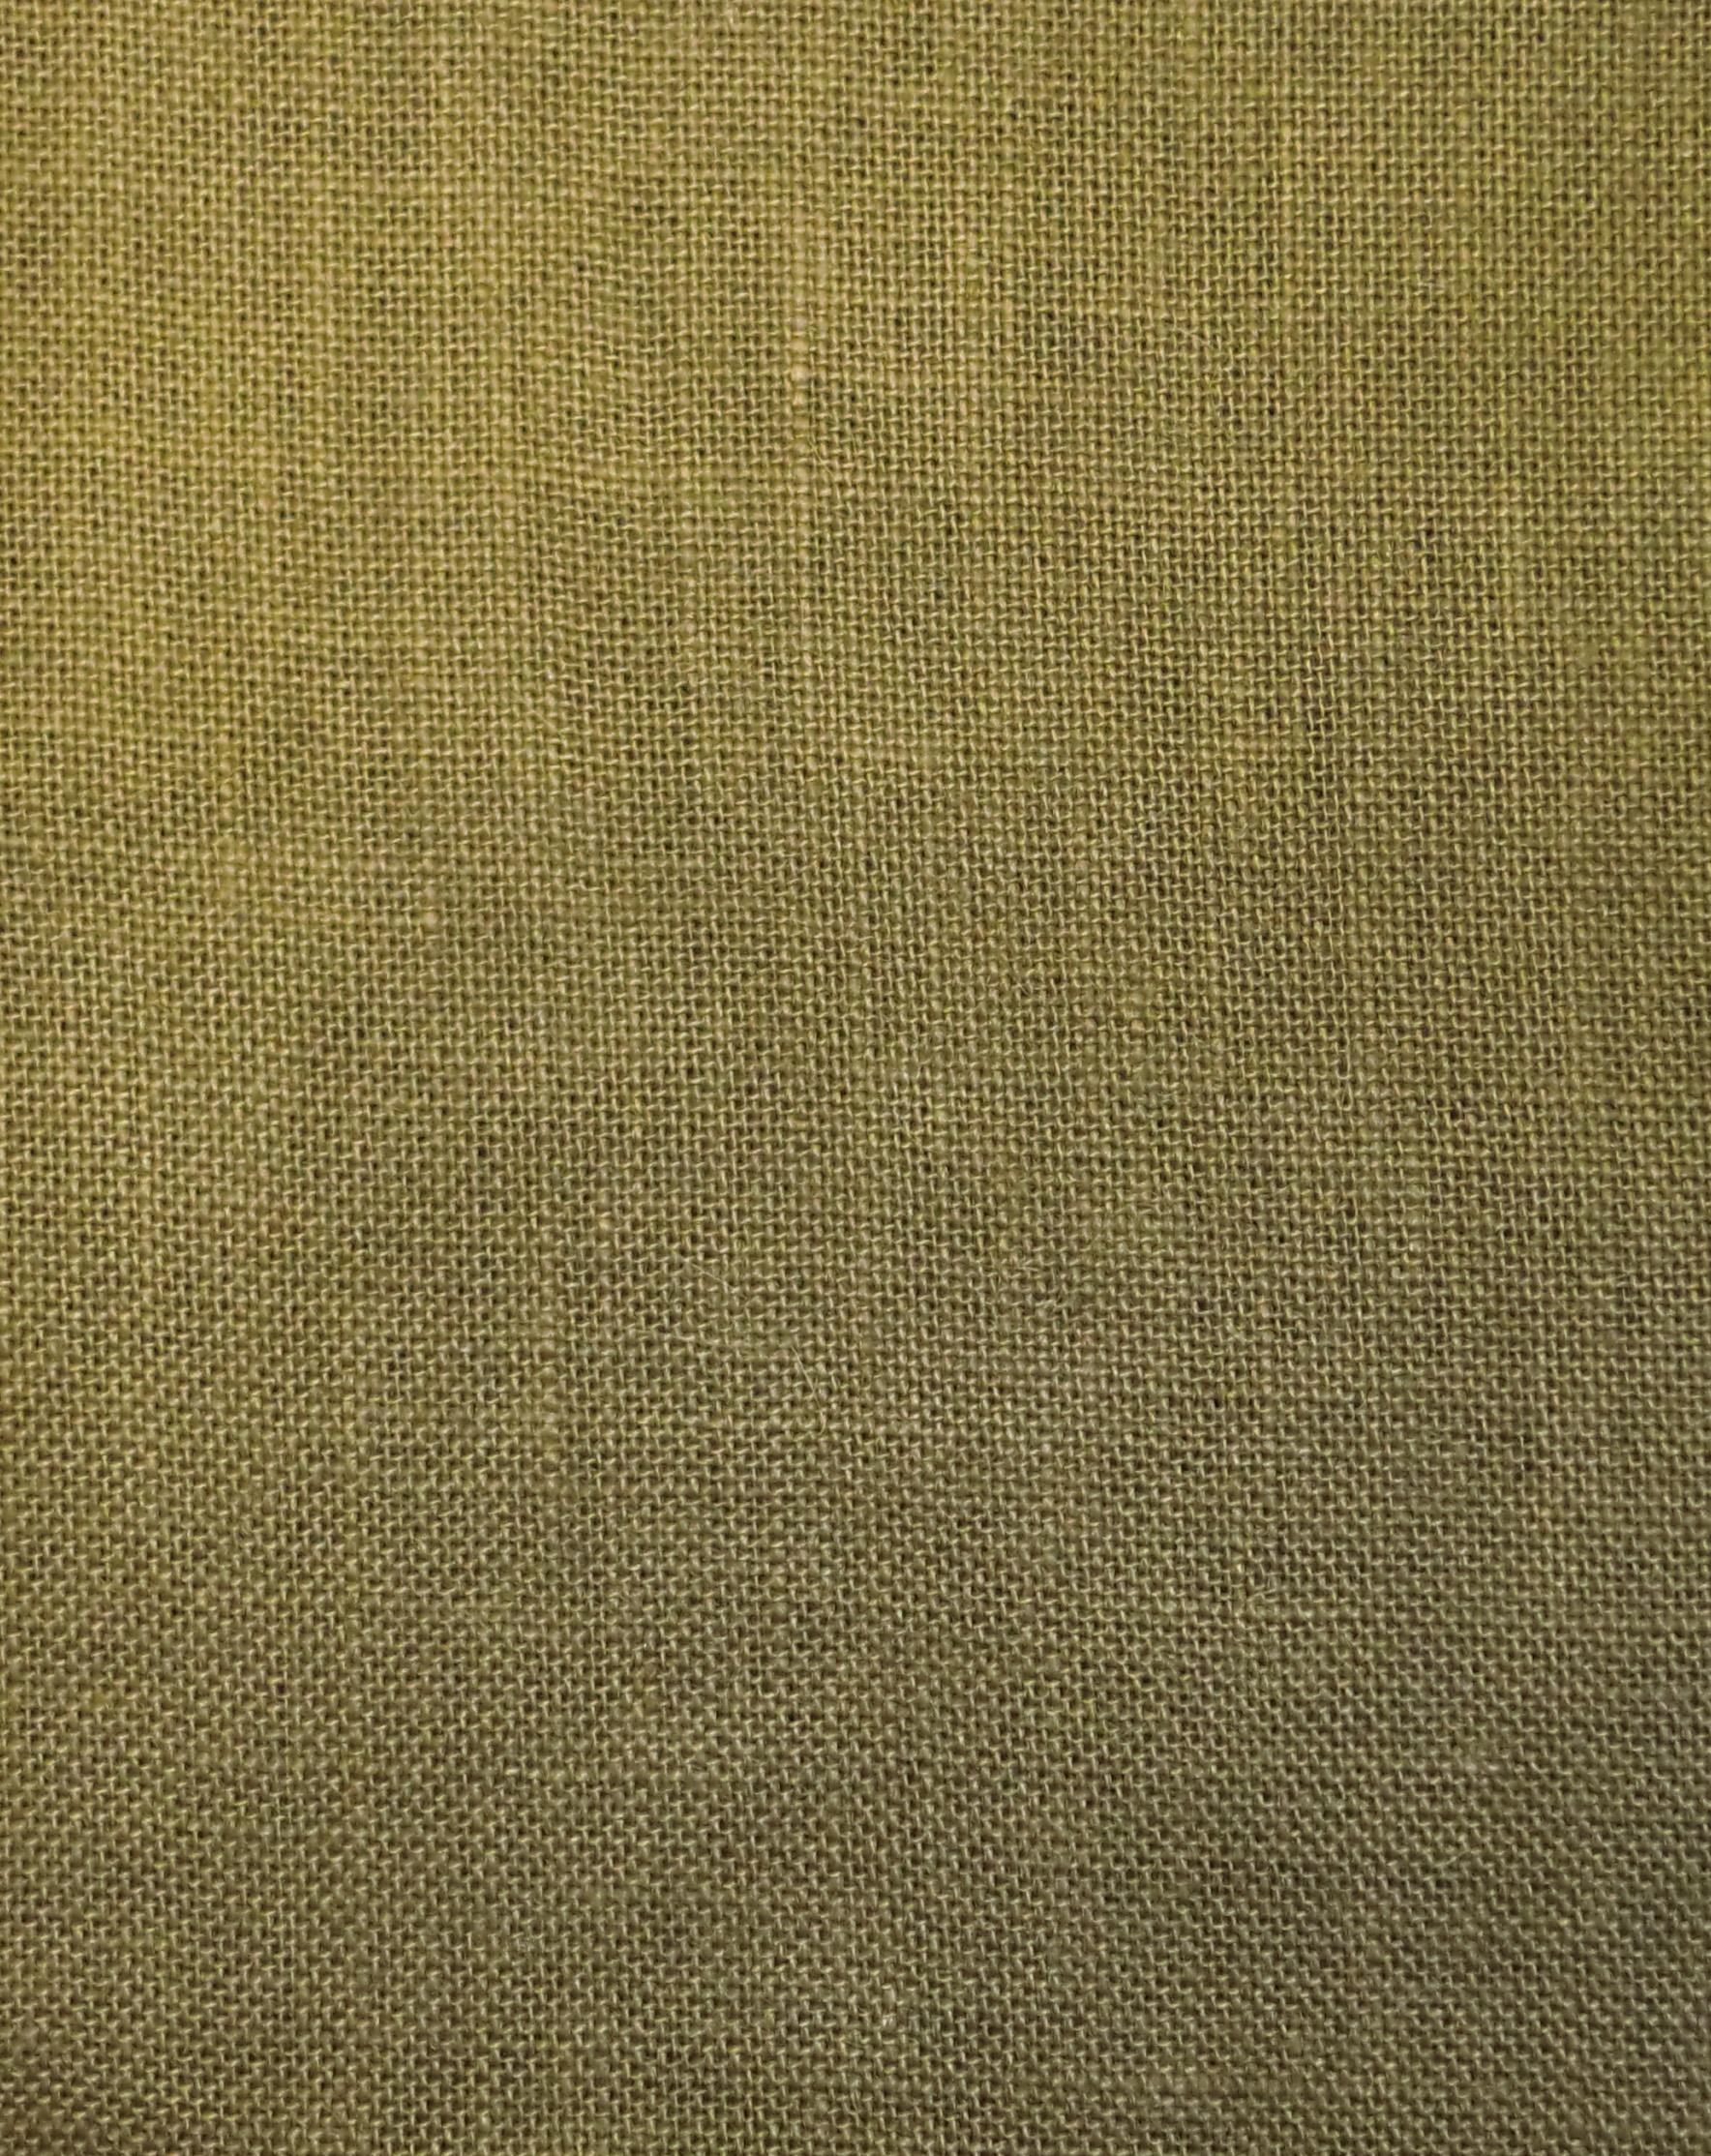 burlap hemp magnolia fabrics interior mall